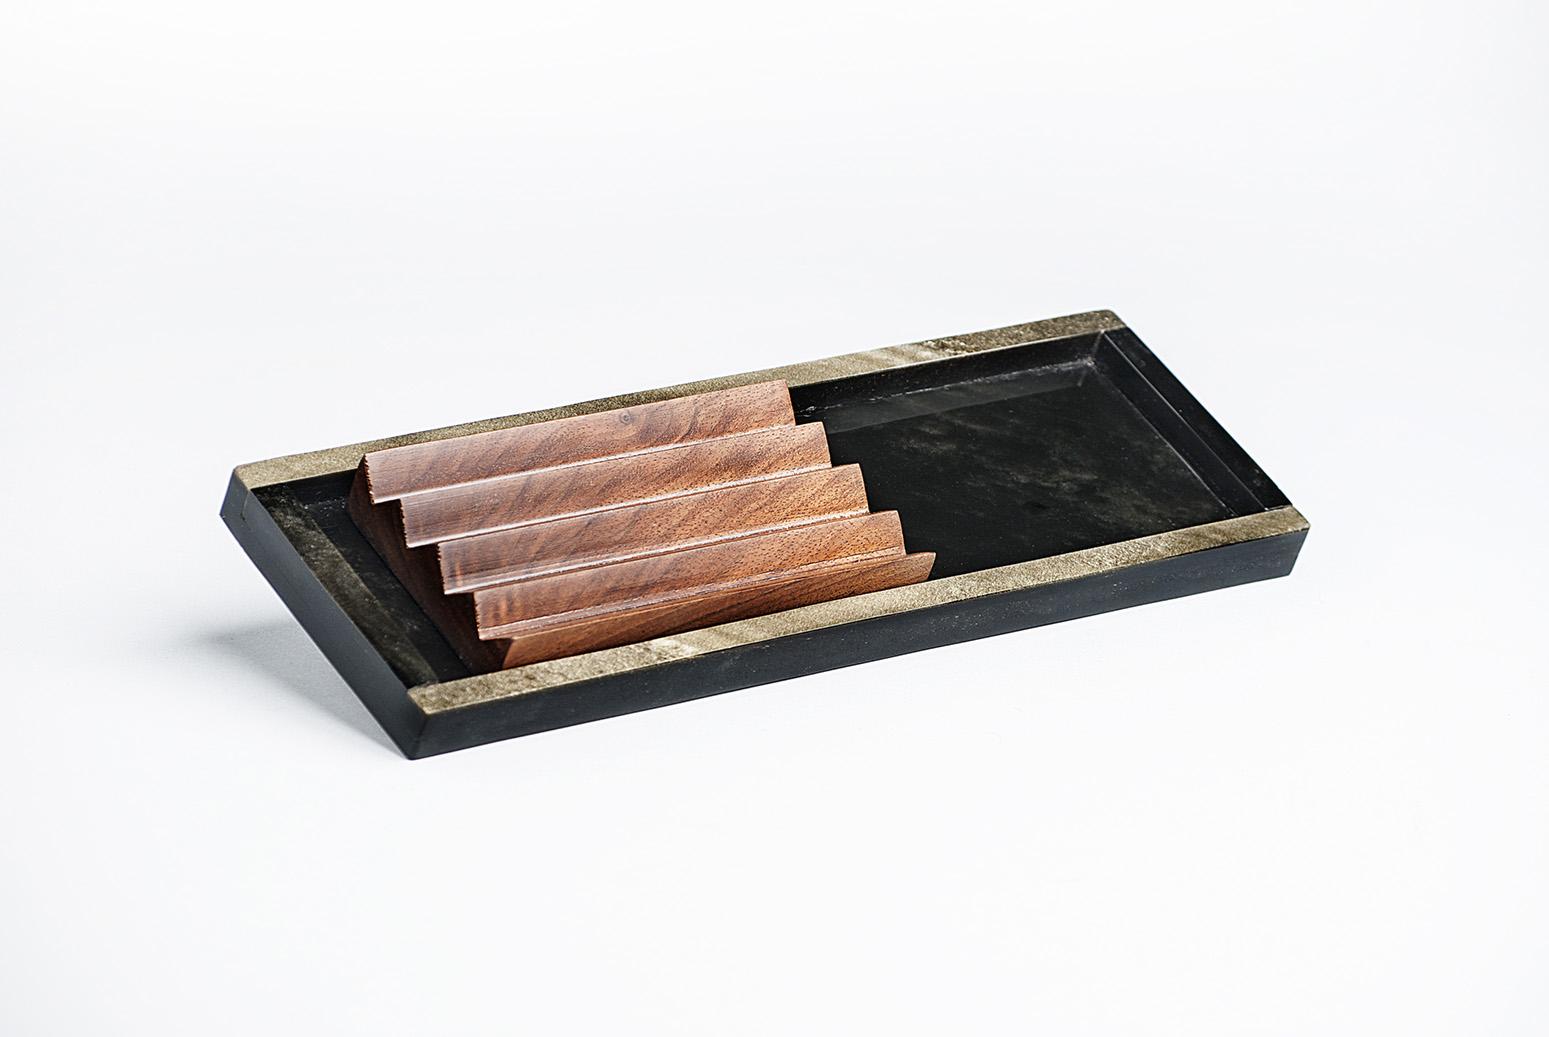 Obsidian-writing-untensil-designer-Francisco Cuellar-artisan-Antonio Ramírez Gómez-Anahuac-MarionFriedmann-MexicoDesignTime15.jpg